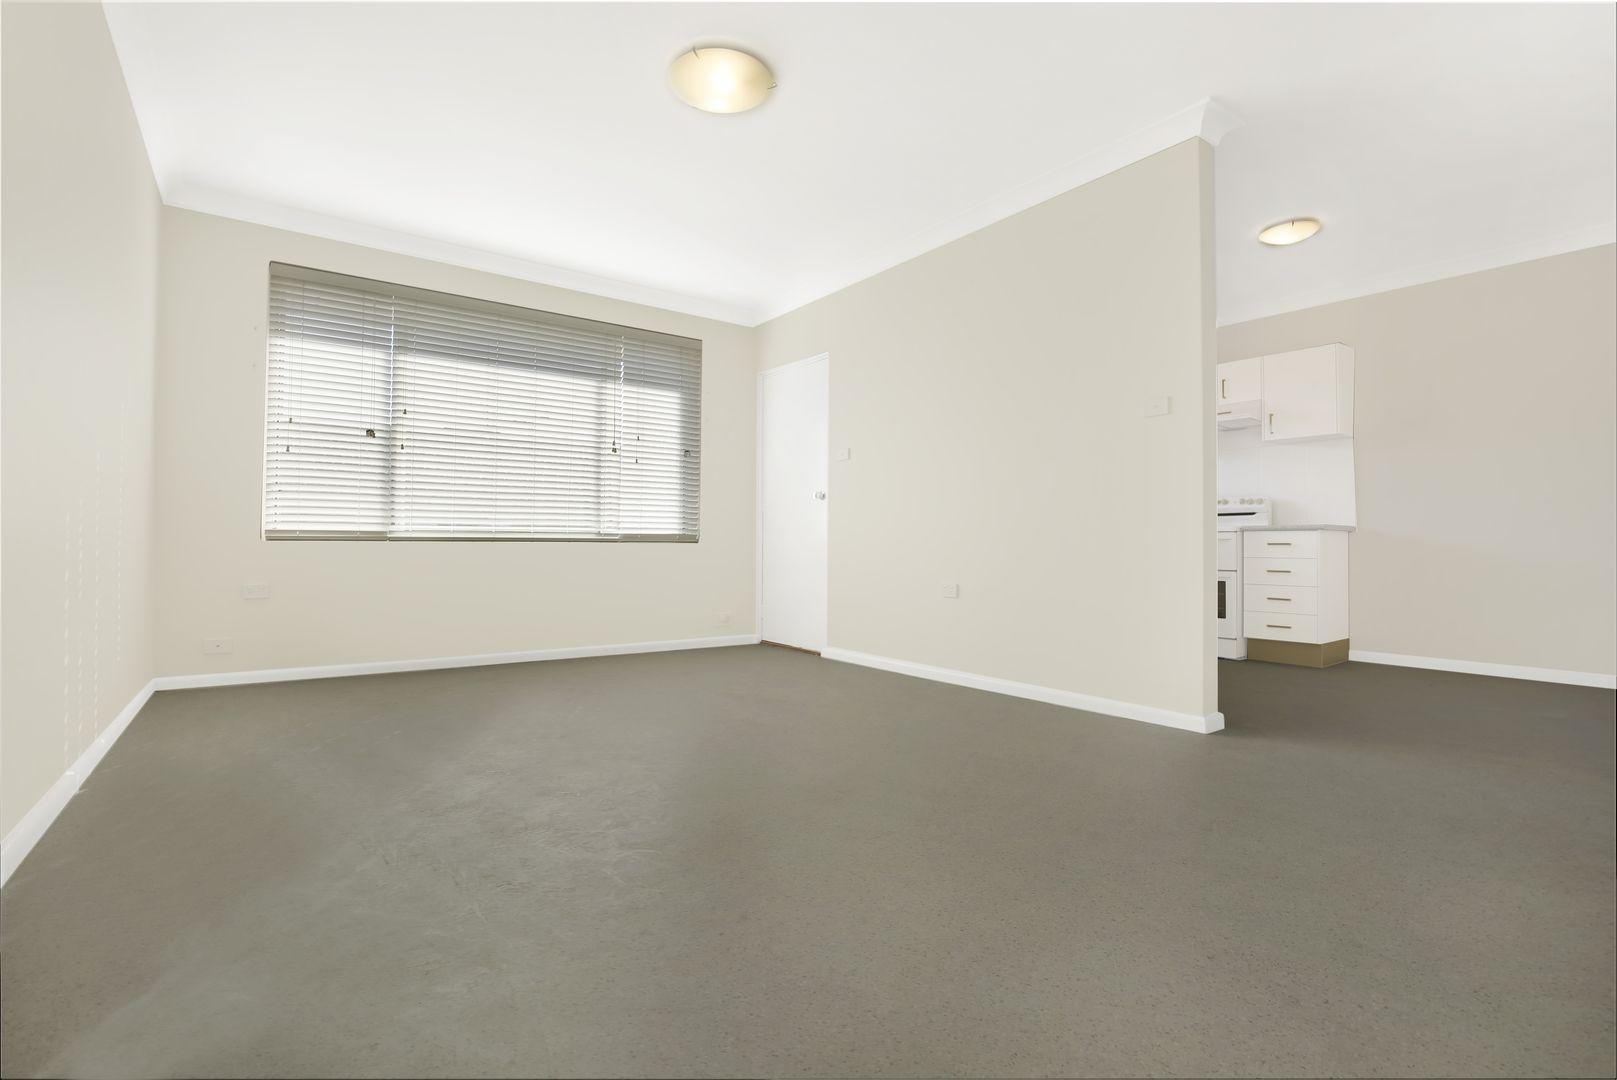 7/52 Kembla  Street, Wollongong NSW 2500, Image 1